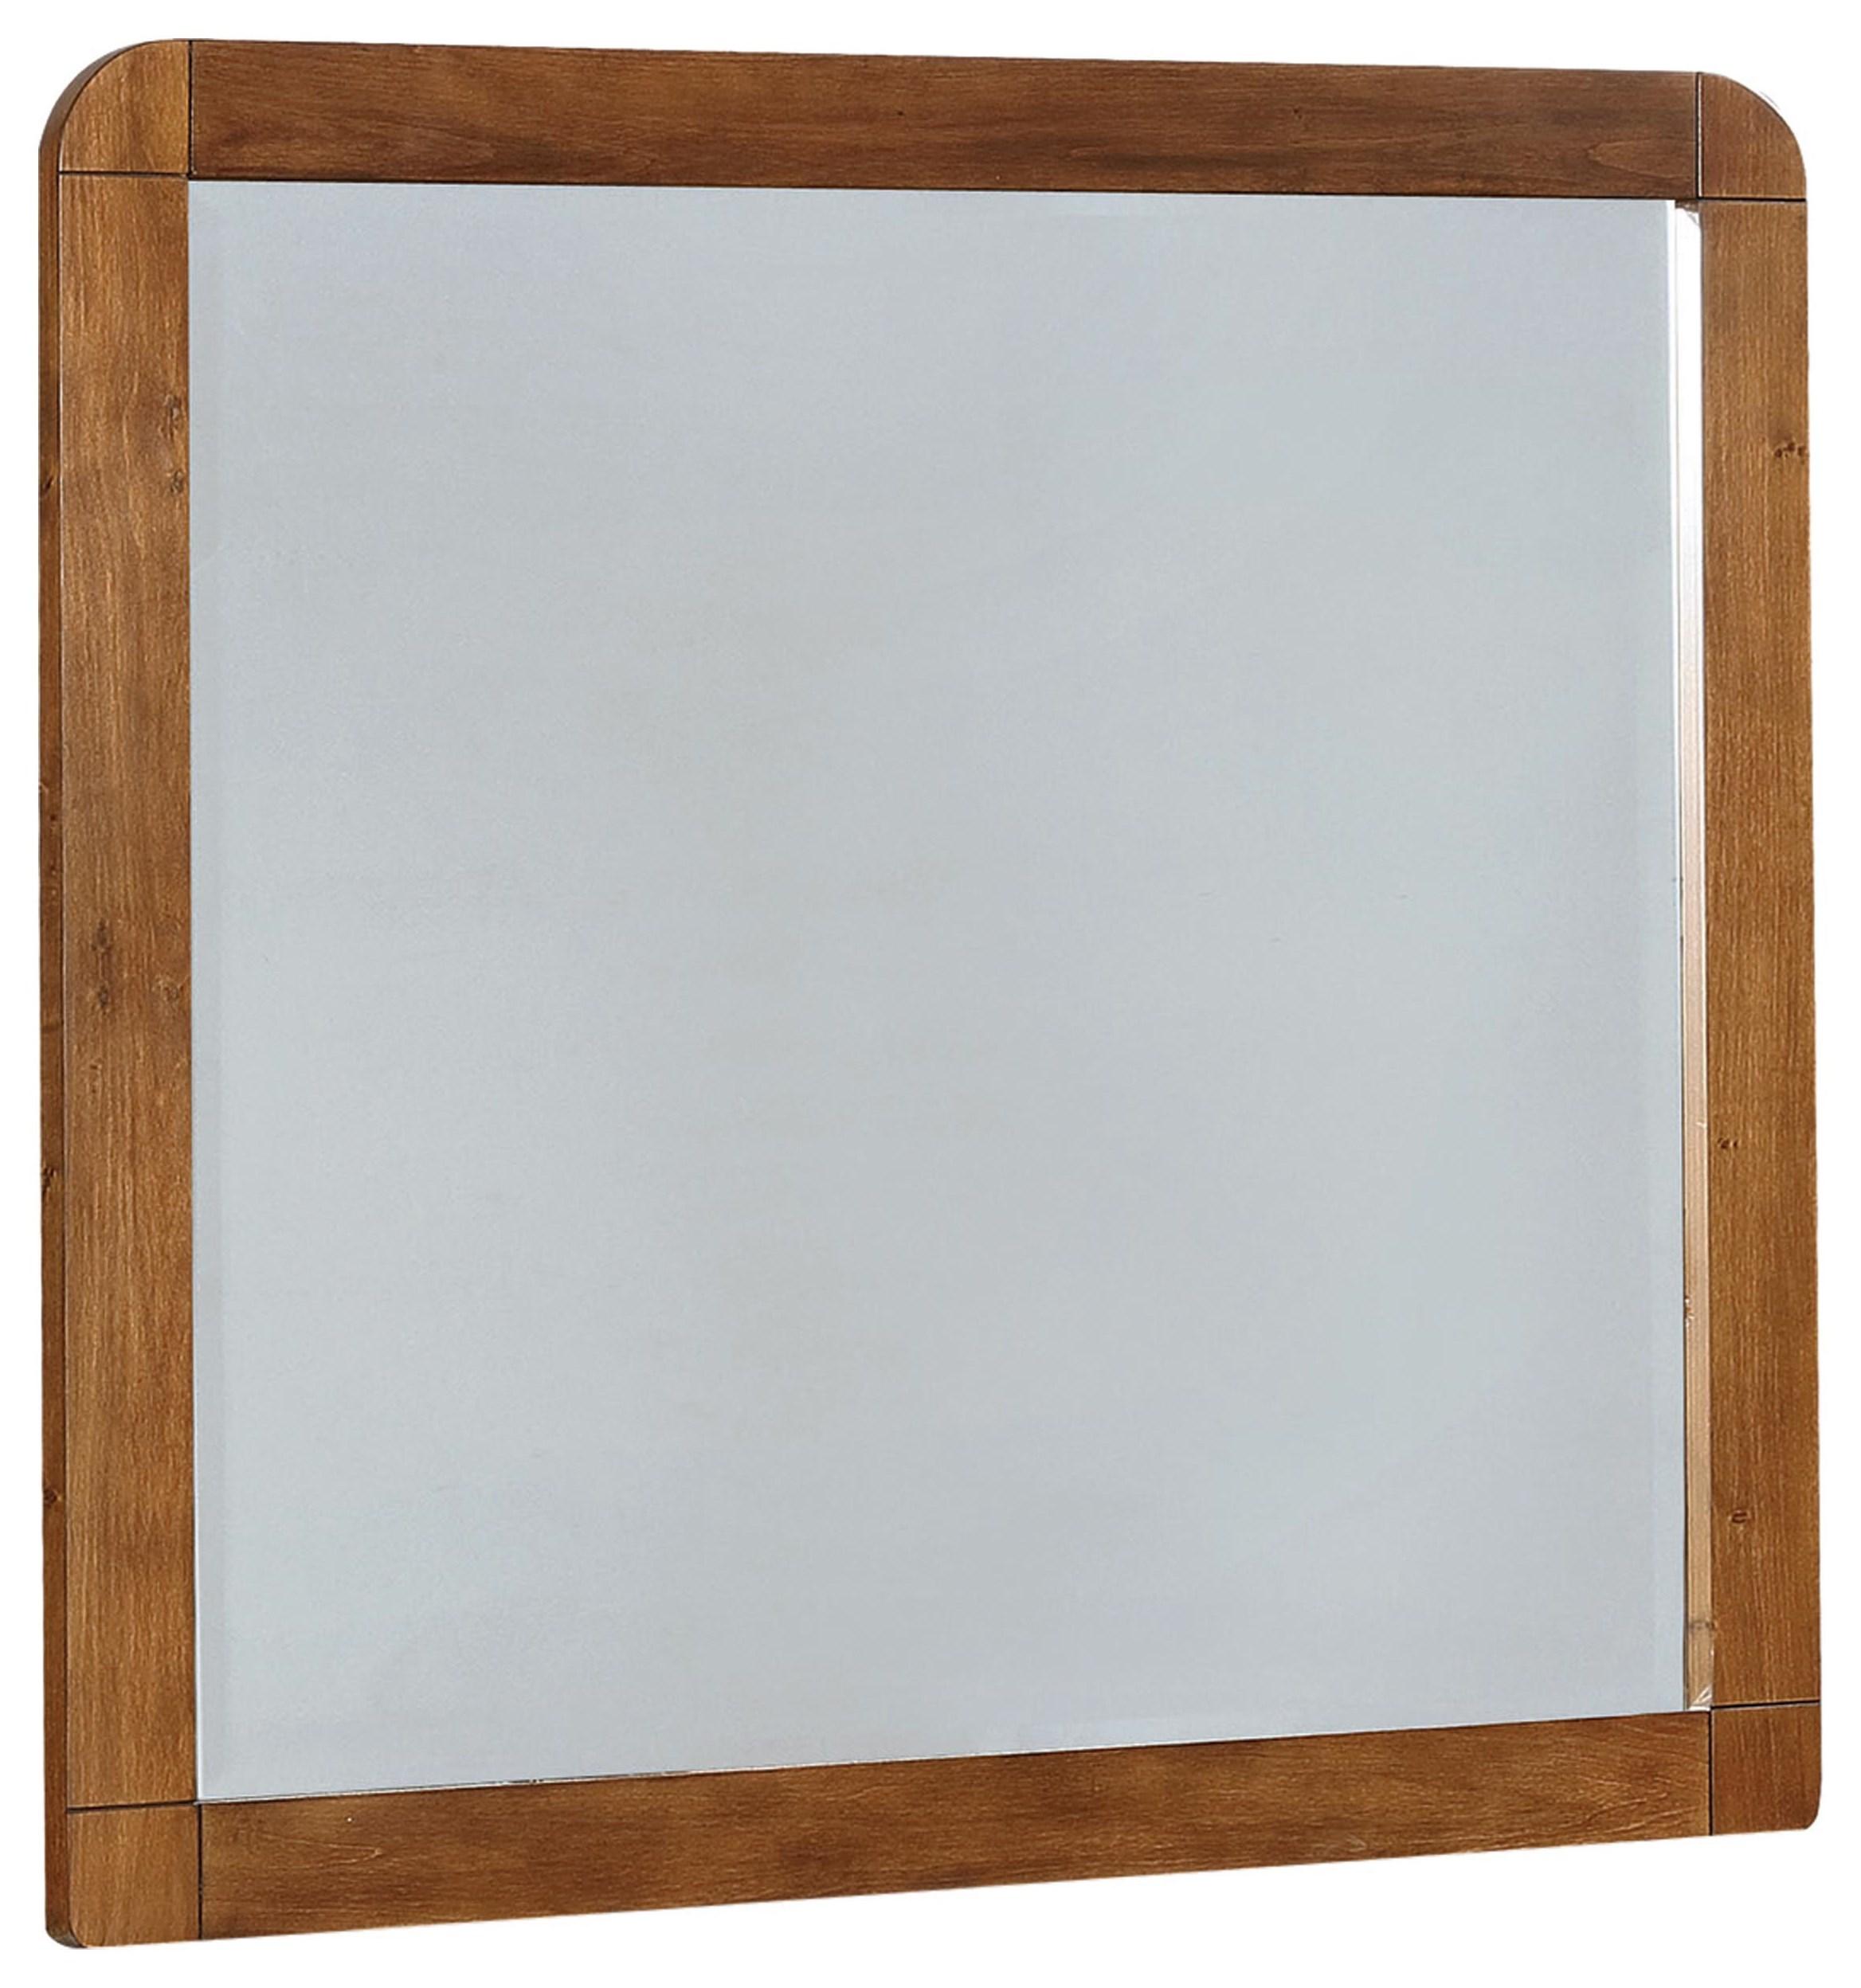 Robyn Mirror by Coaster at Furniture Fair - North Carolina